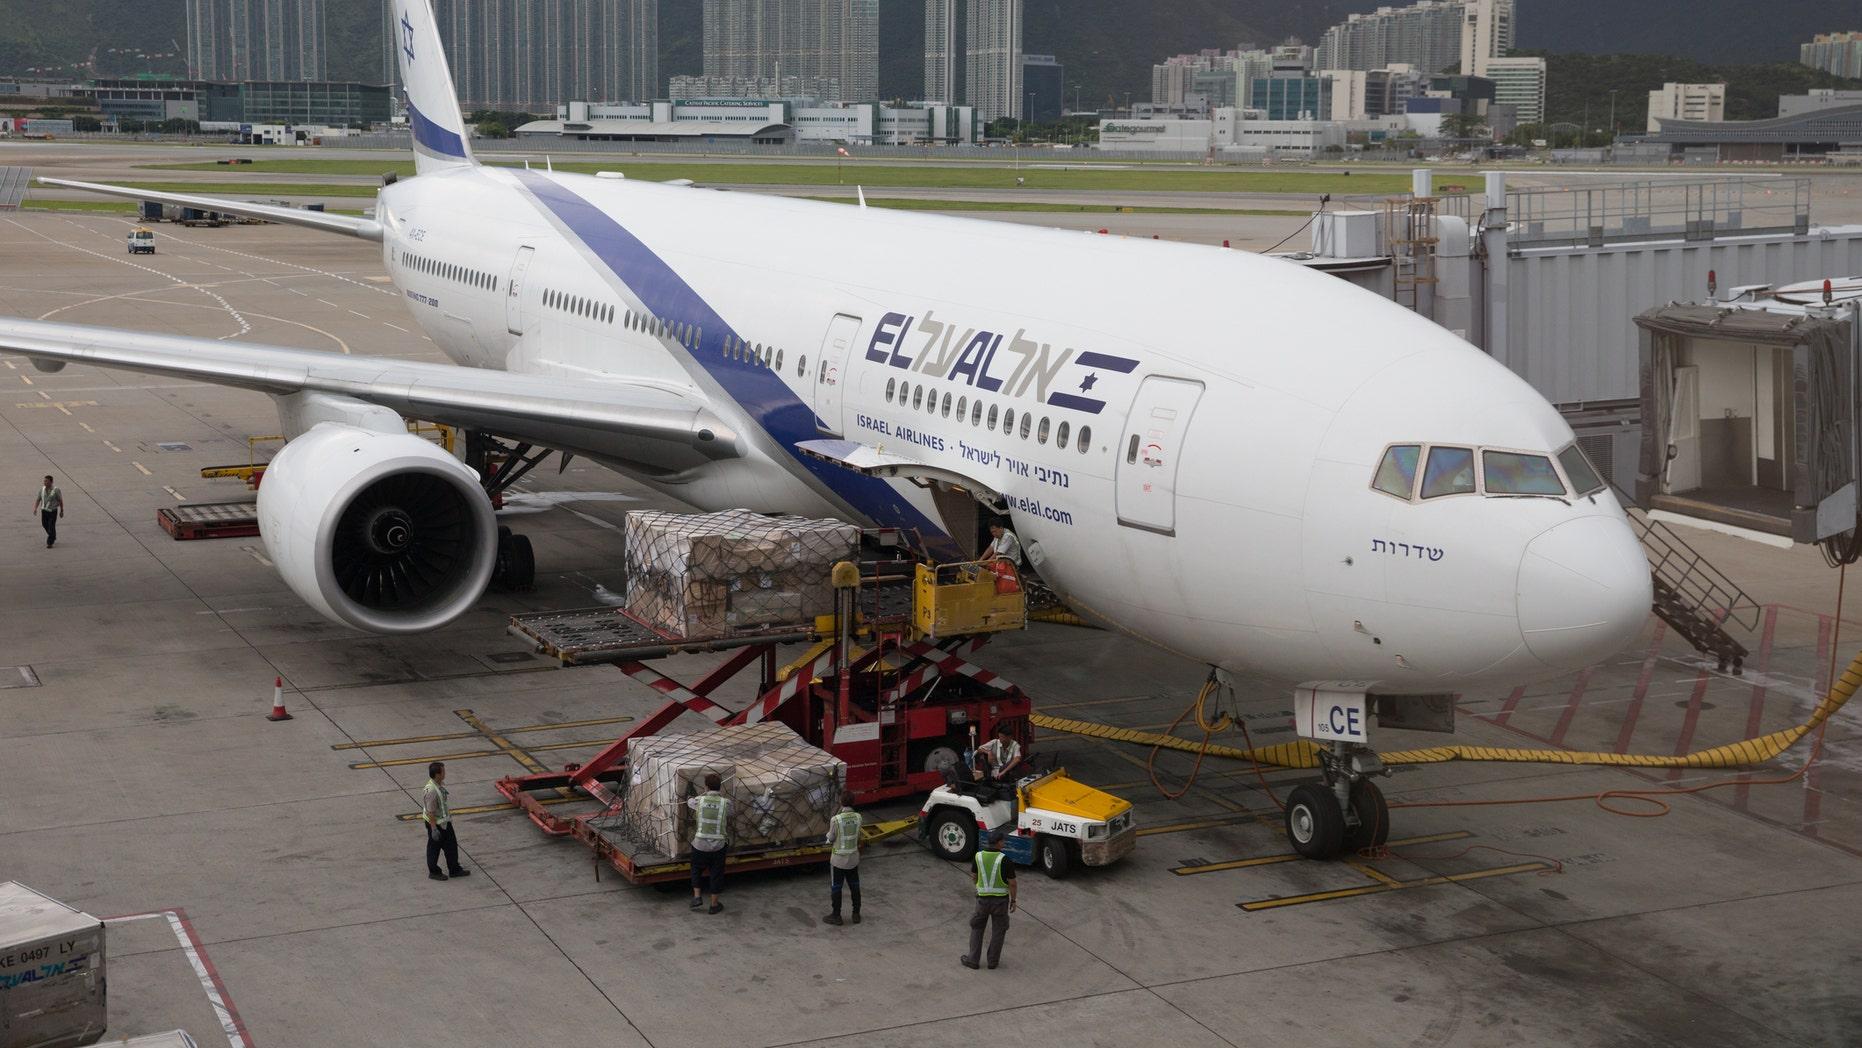 El Al Israel Airlines Boeing 777-200 parked at Hong Kong International Airport.